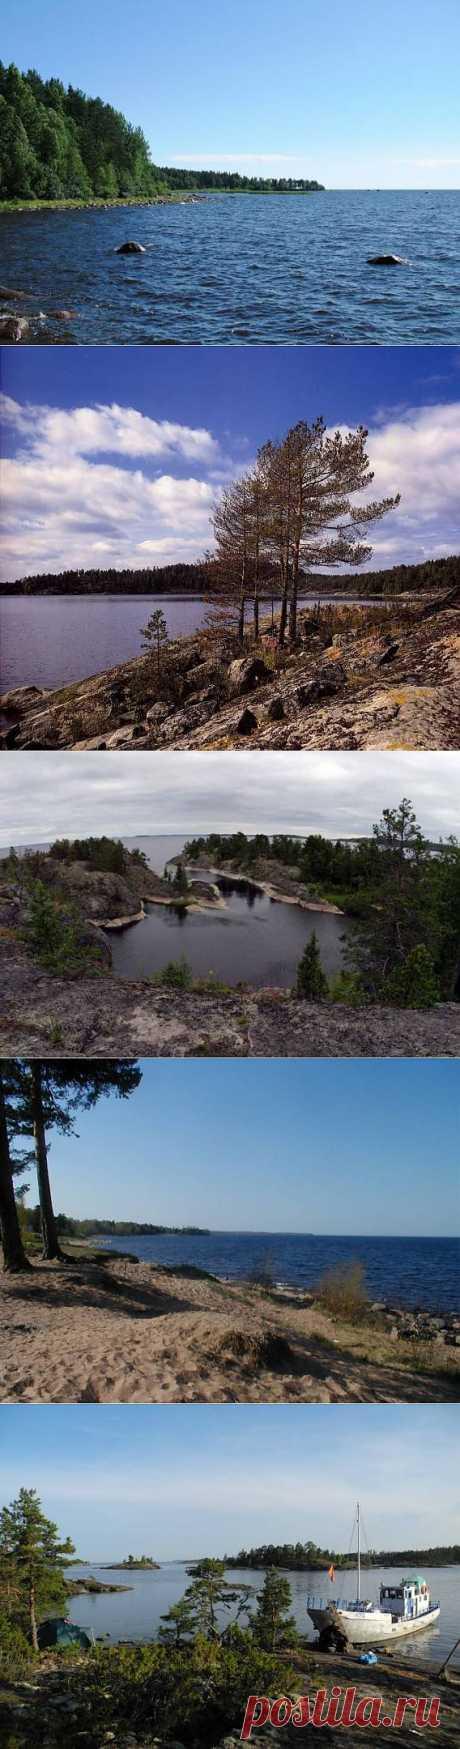 (+1) - el lago Ládoga Asombroso | ASOMBROSO